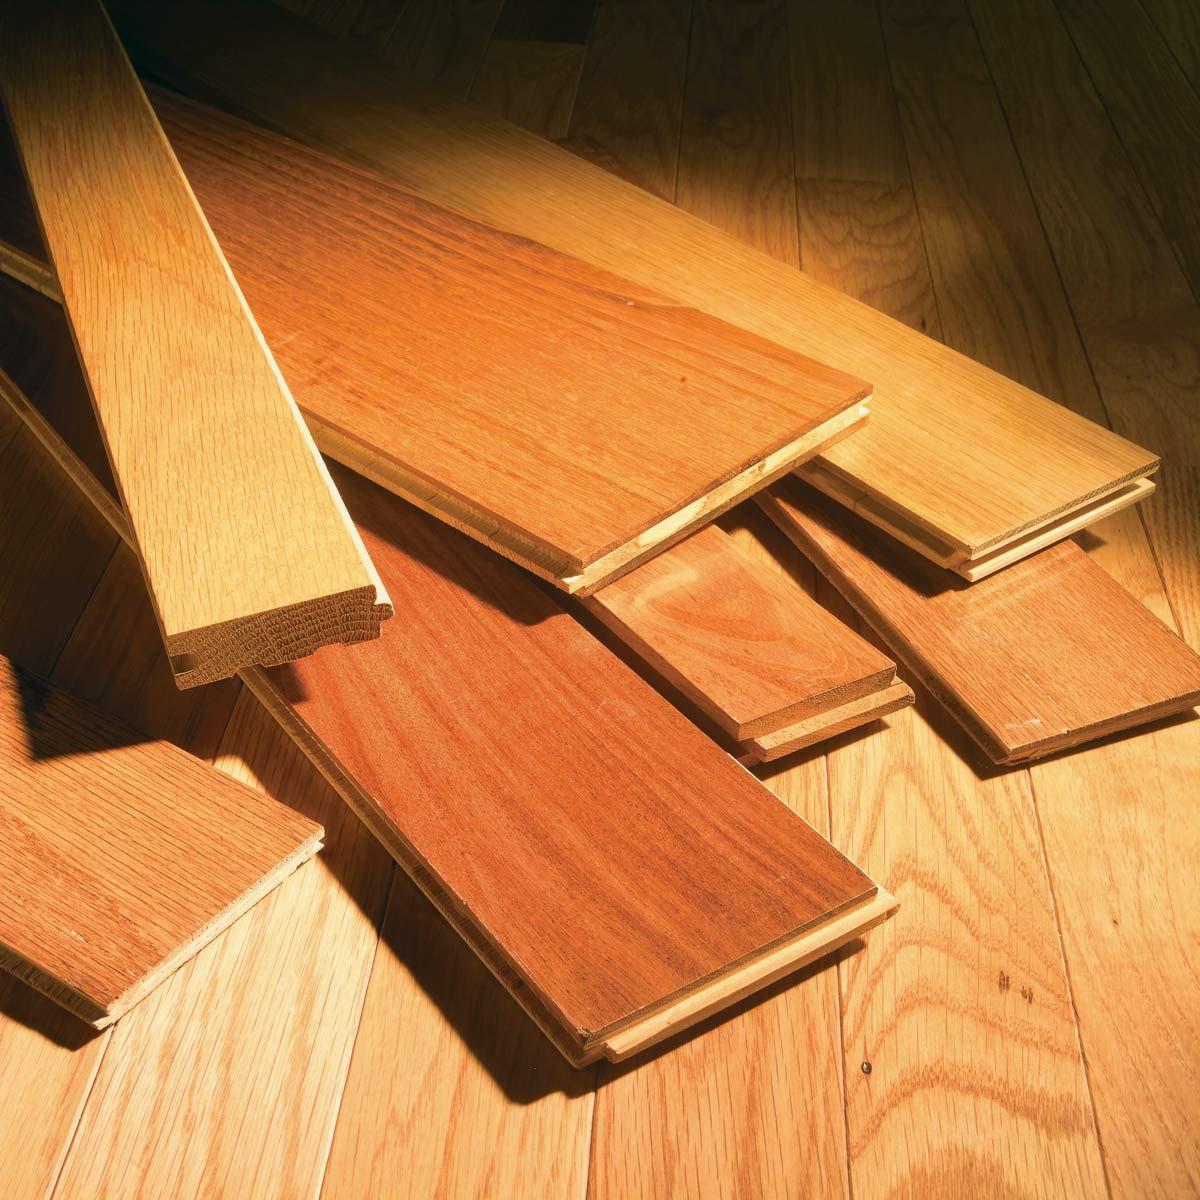 12 Flooring Trends for 2018 Wood floor installation